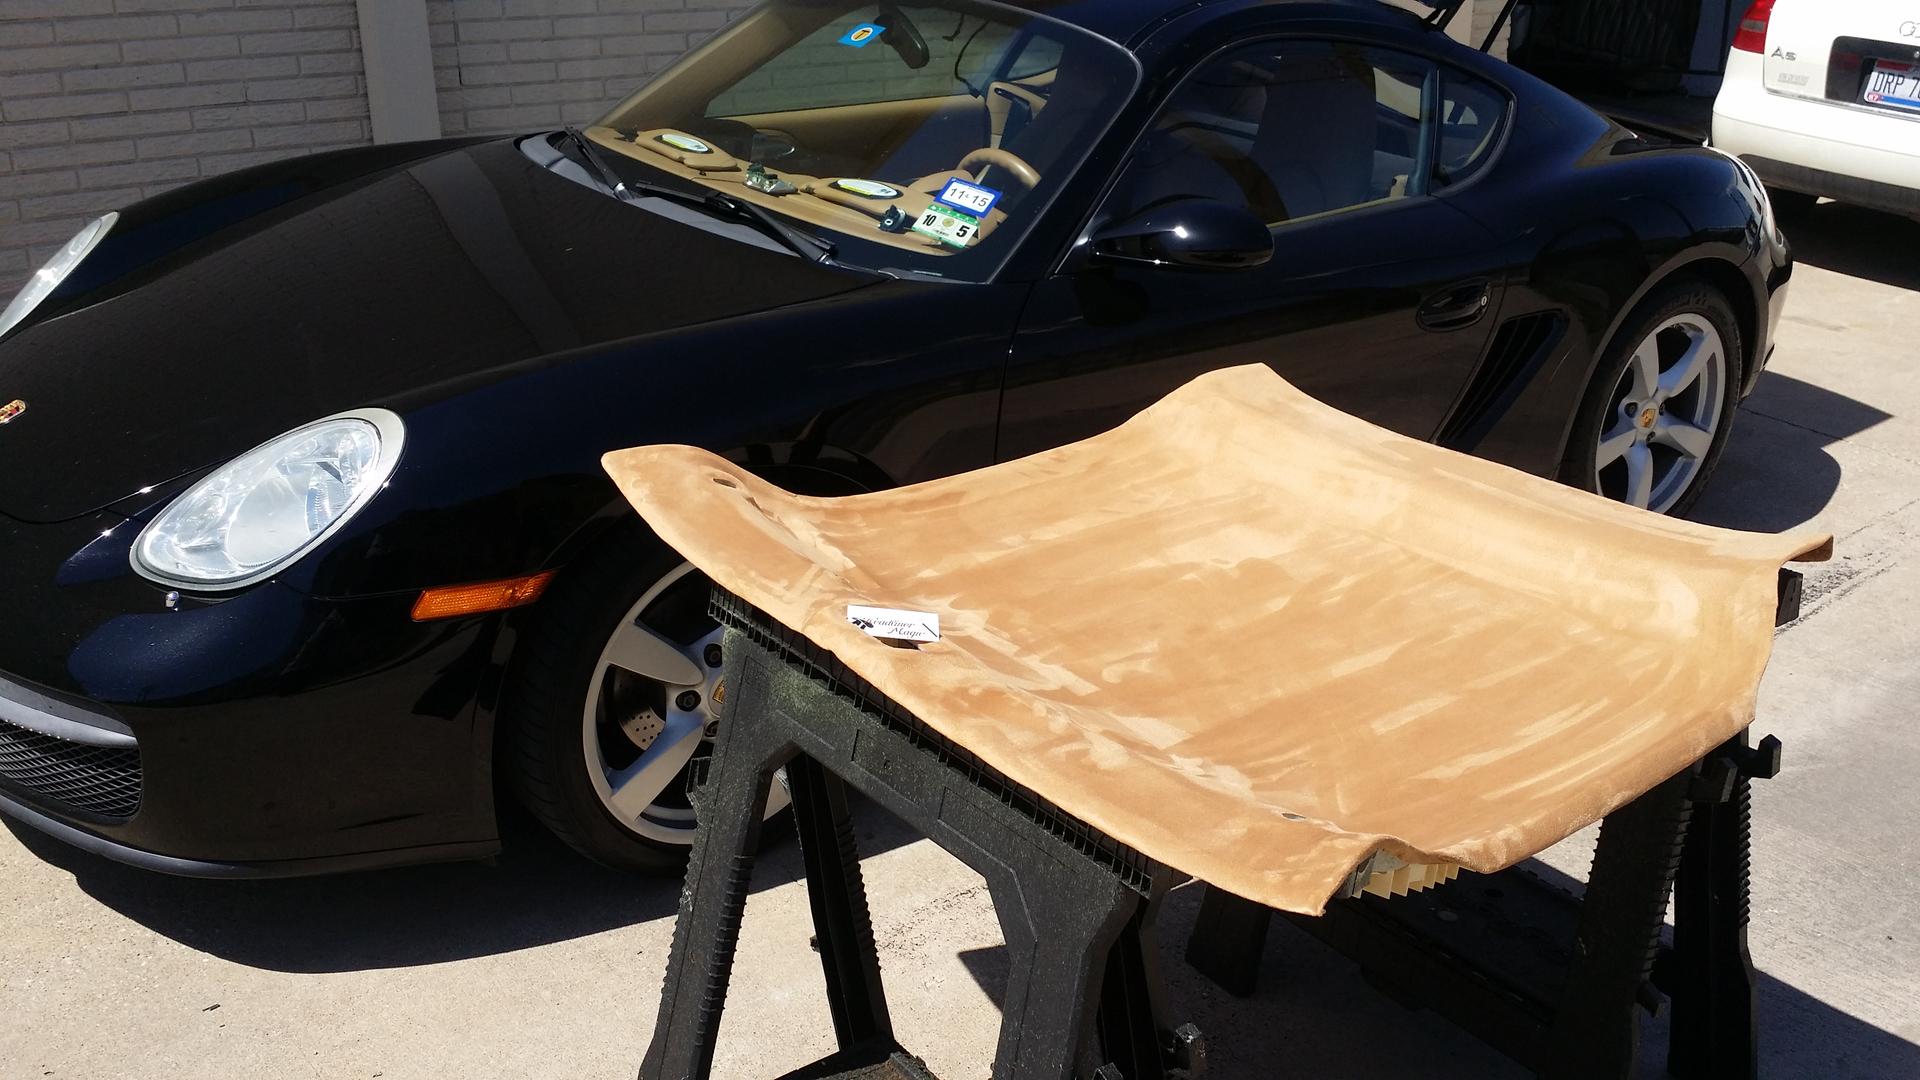 Car interior roof repair - Headliner Magic Headliner Repair Auto Headliner Replacements Headliner Fabric